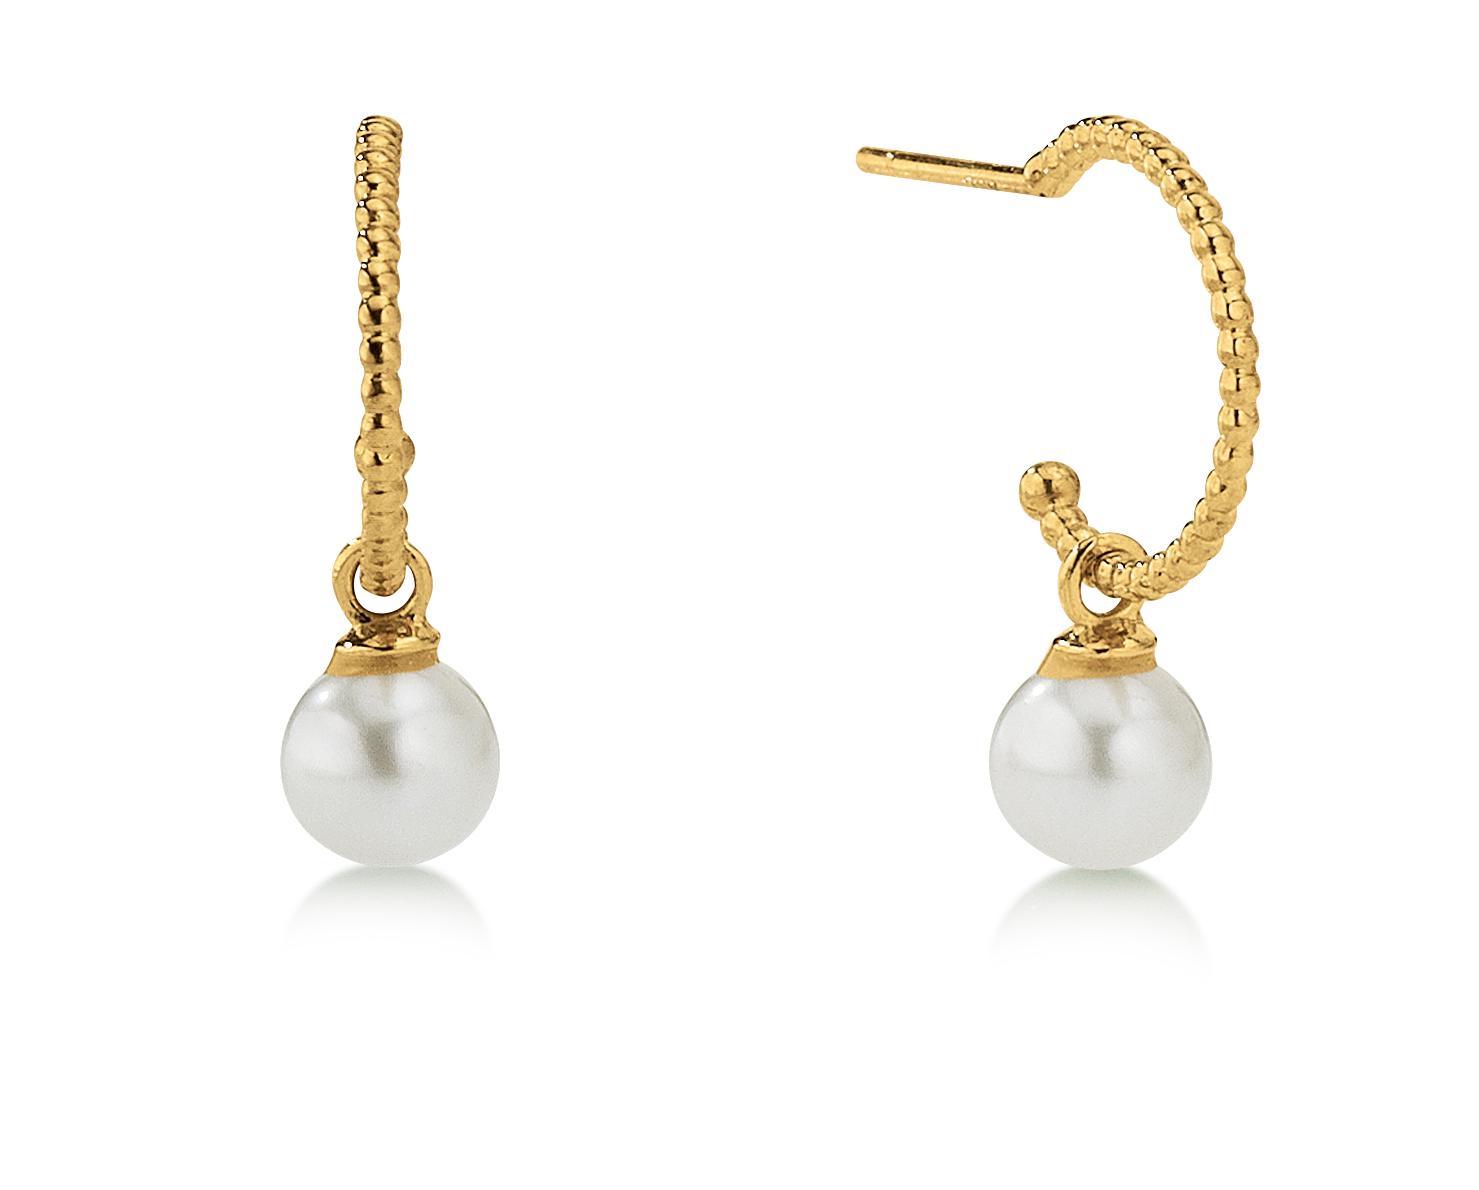 Image of   Aagaard 8 kt creol med perle - 08993675-31